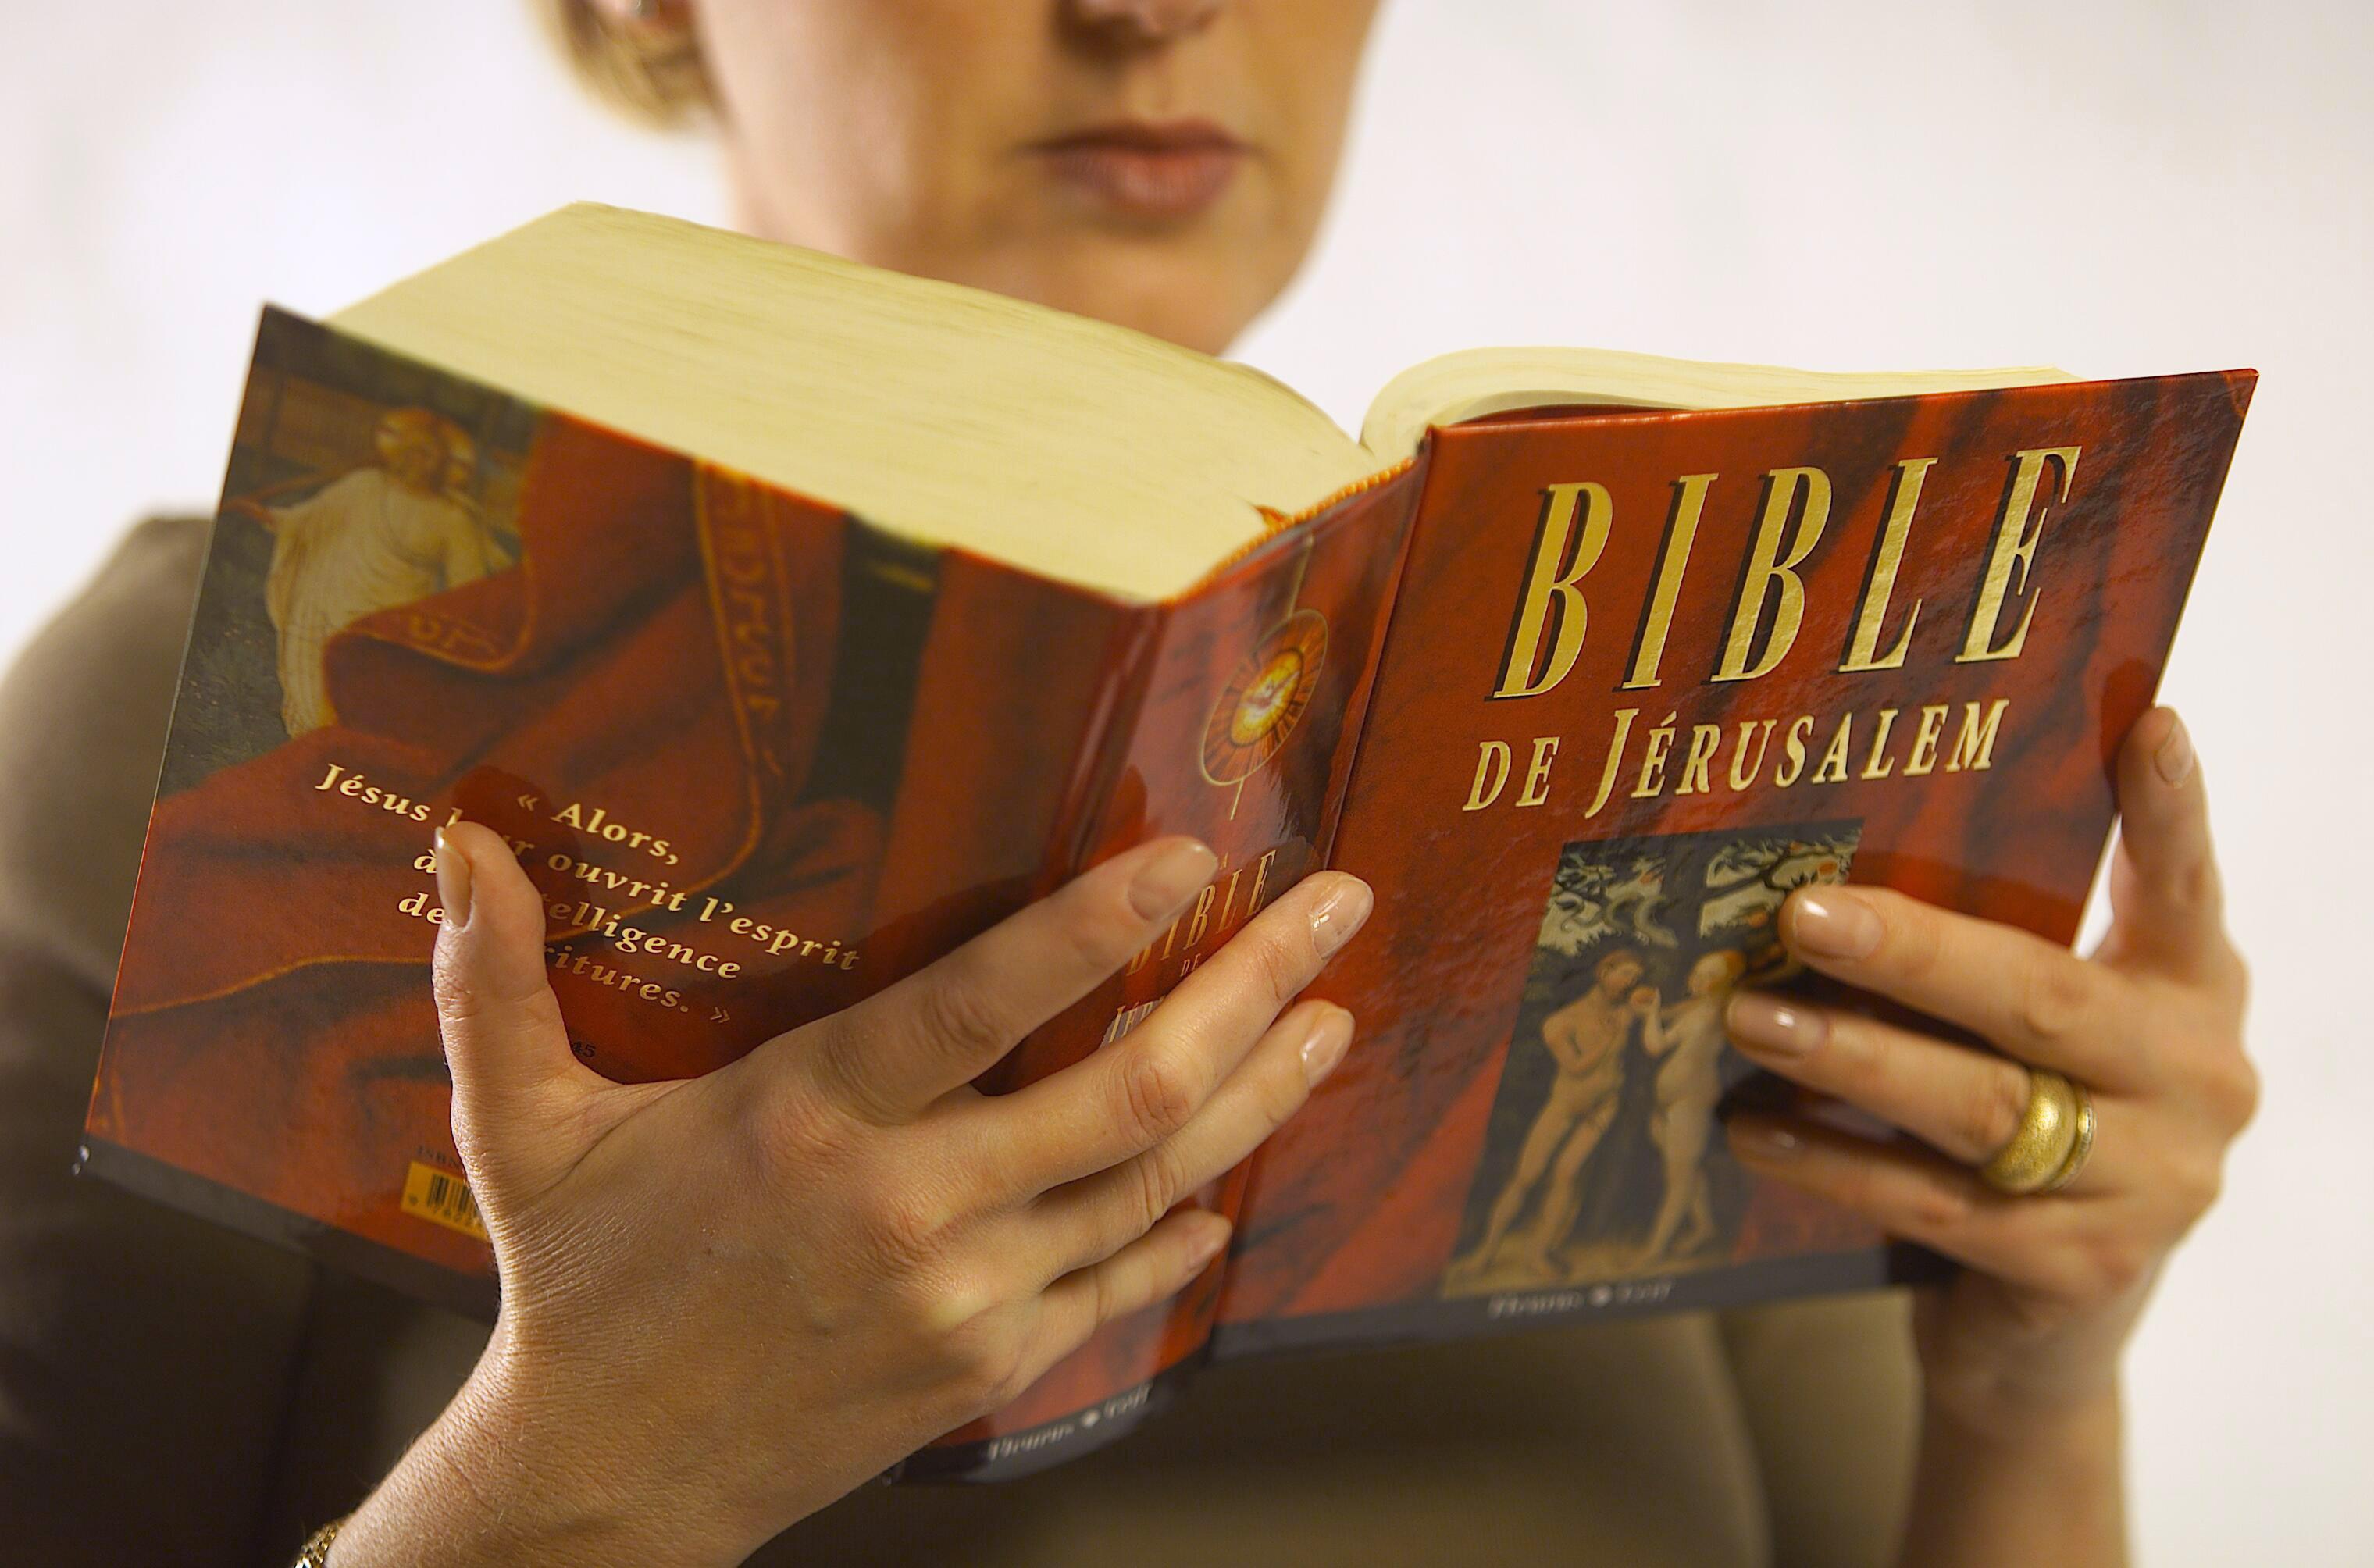 WEB2-BIBLE-GODONG-FR130079C.jpg